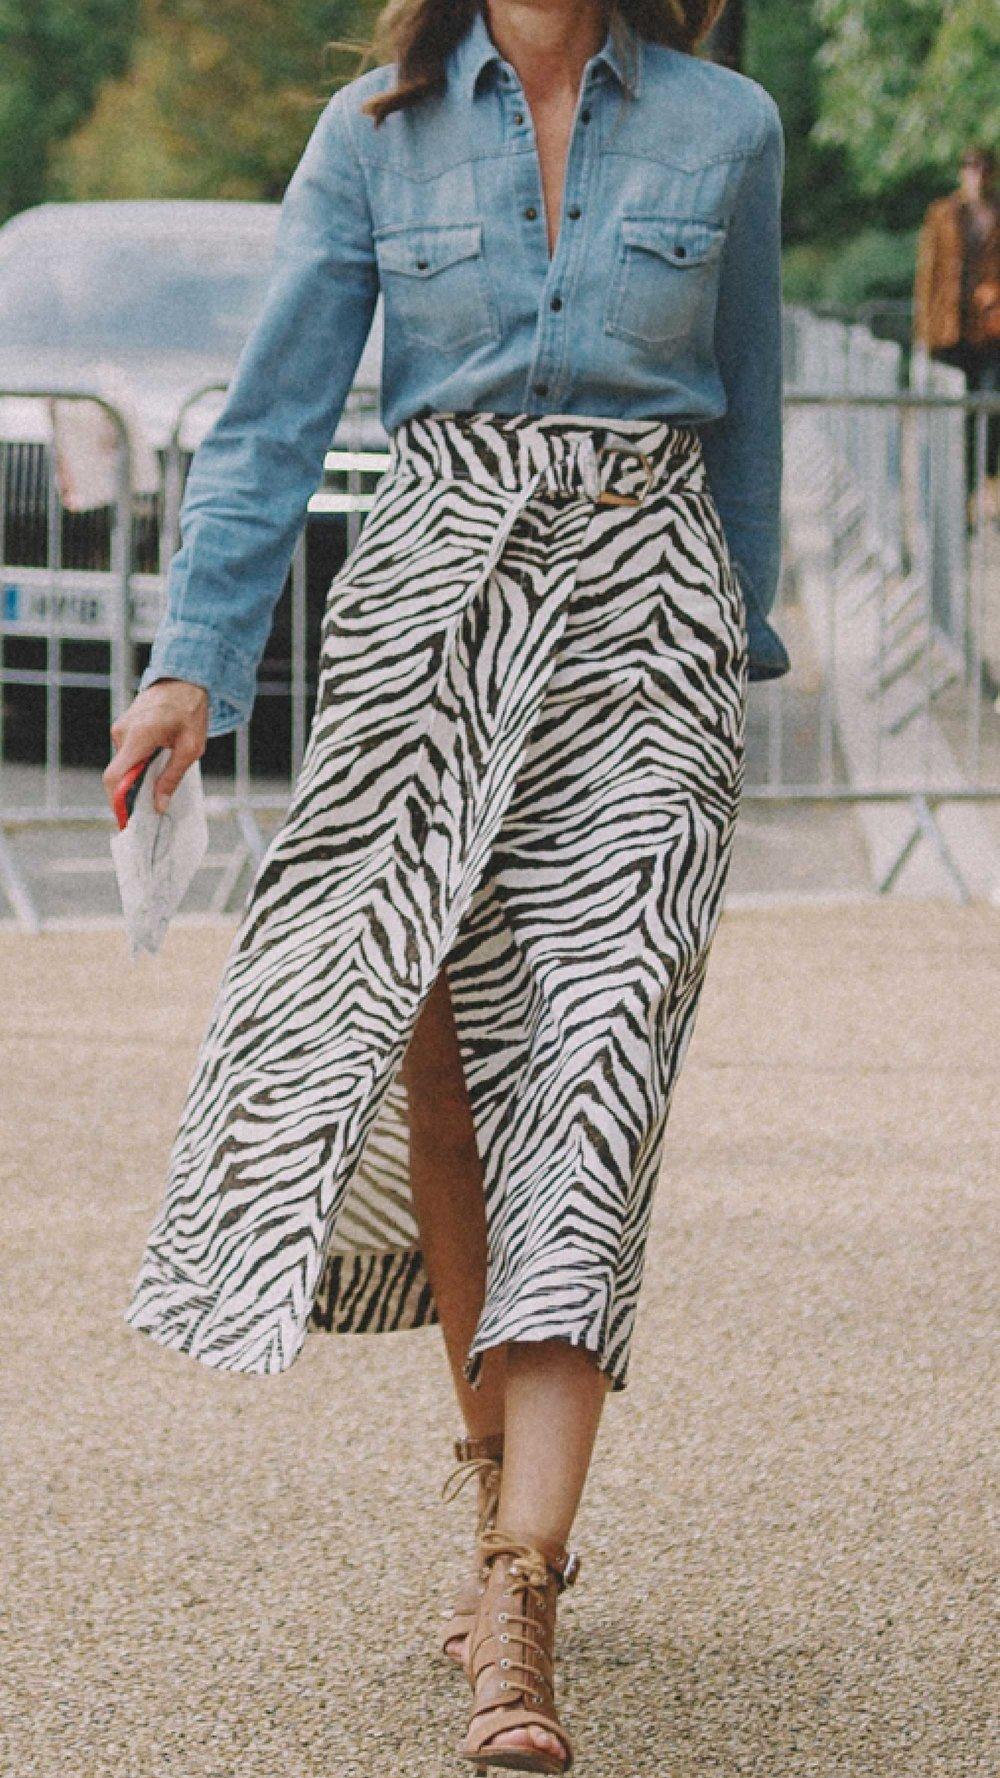 London Fashion Week Street Style Day 3 SS19 -2.jpg